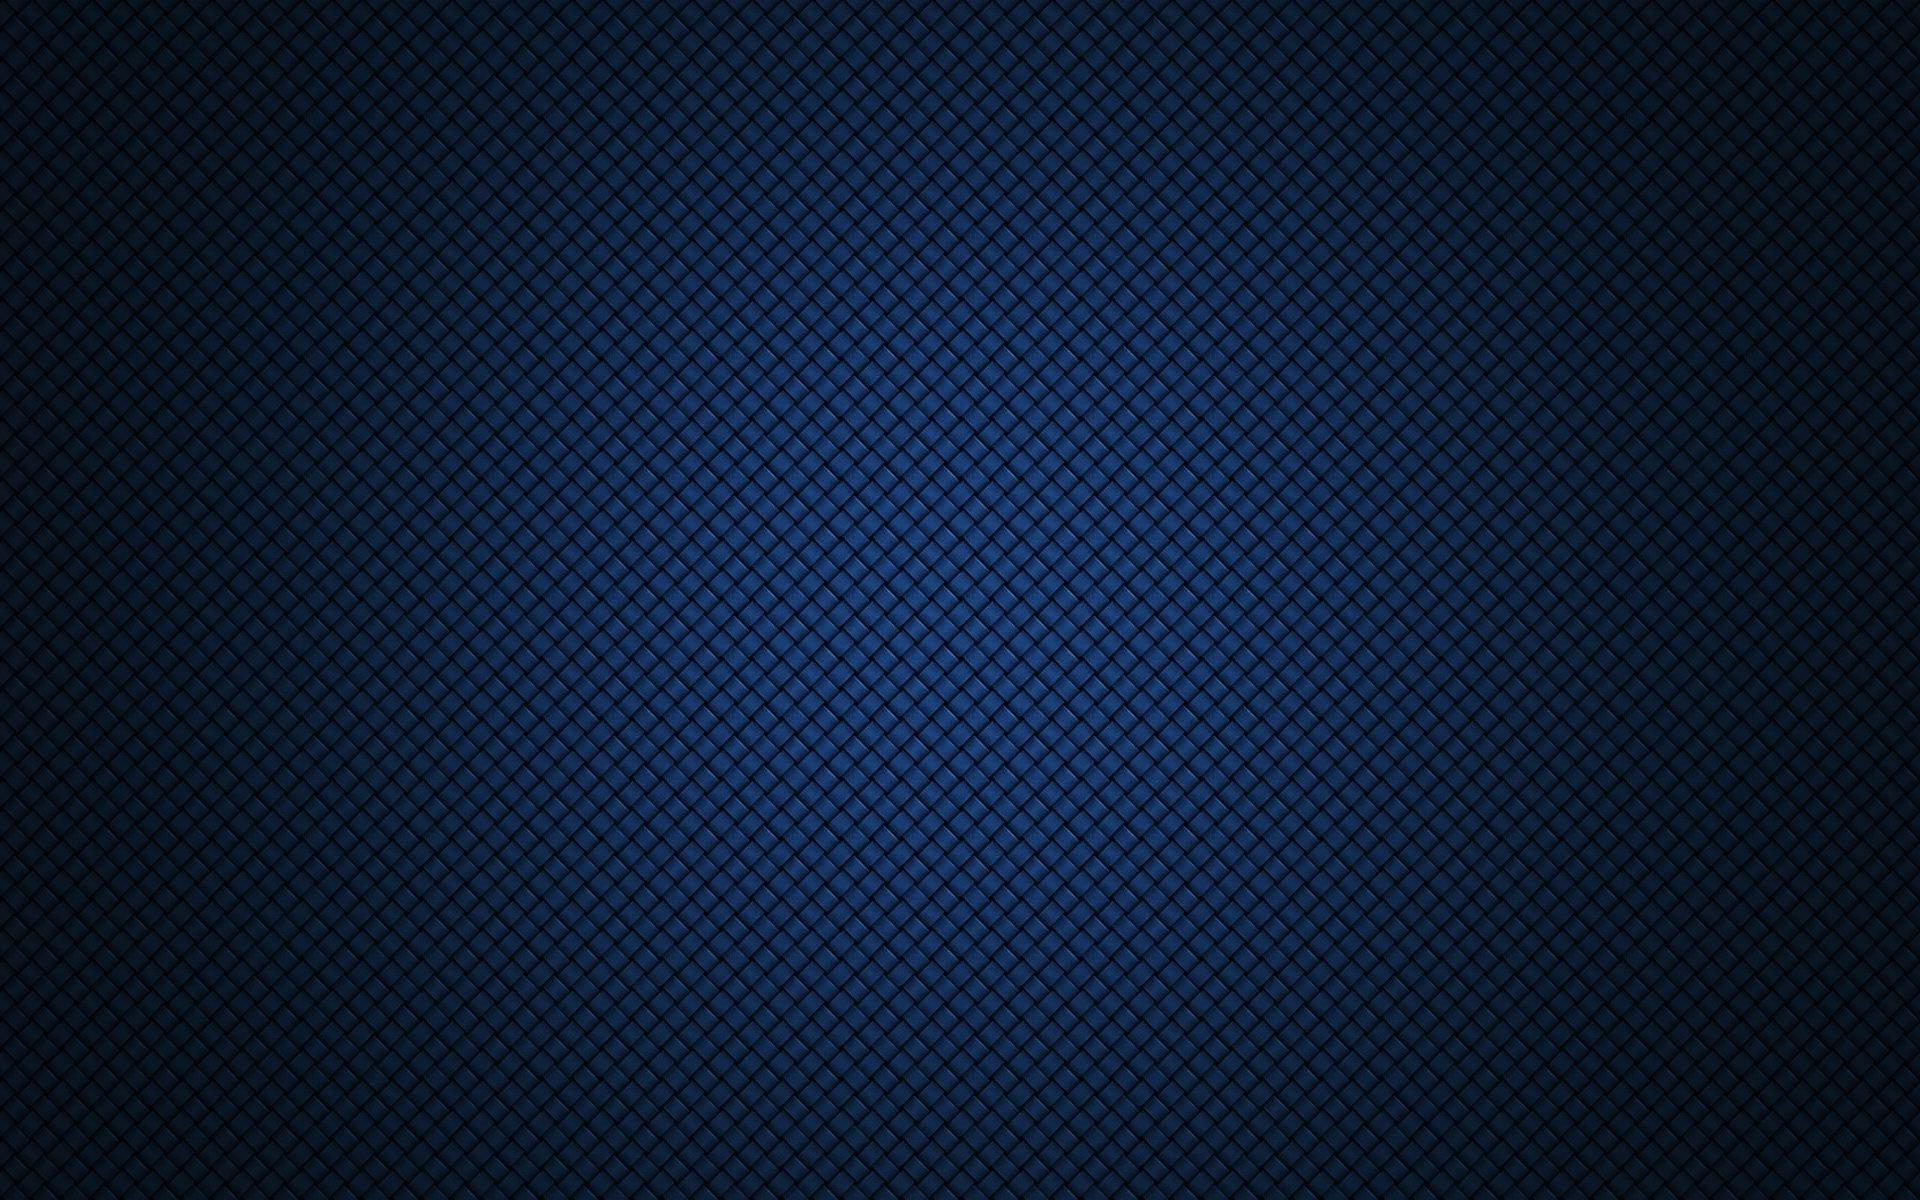 Dark blue checks plain HD wallpapers | HD Wallpapers Rocks